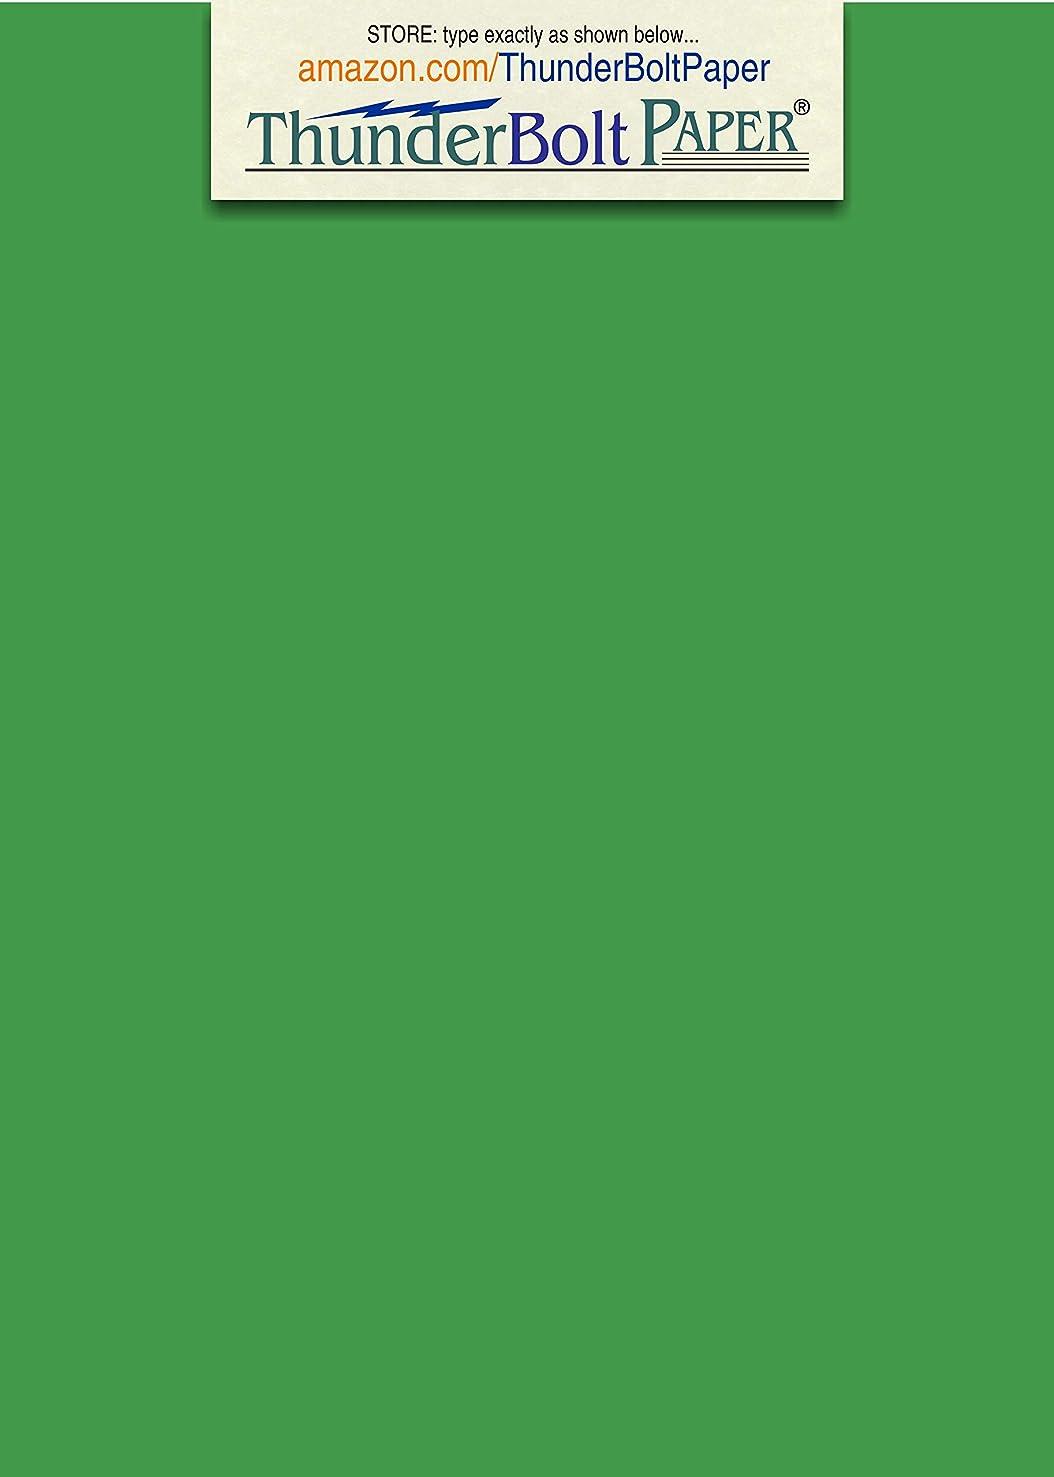 150 Bright Green 65lb Cover Card Paper - 5